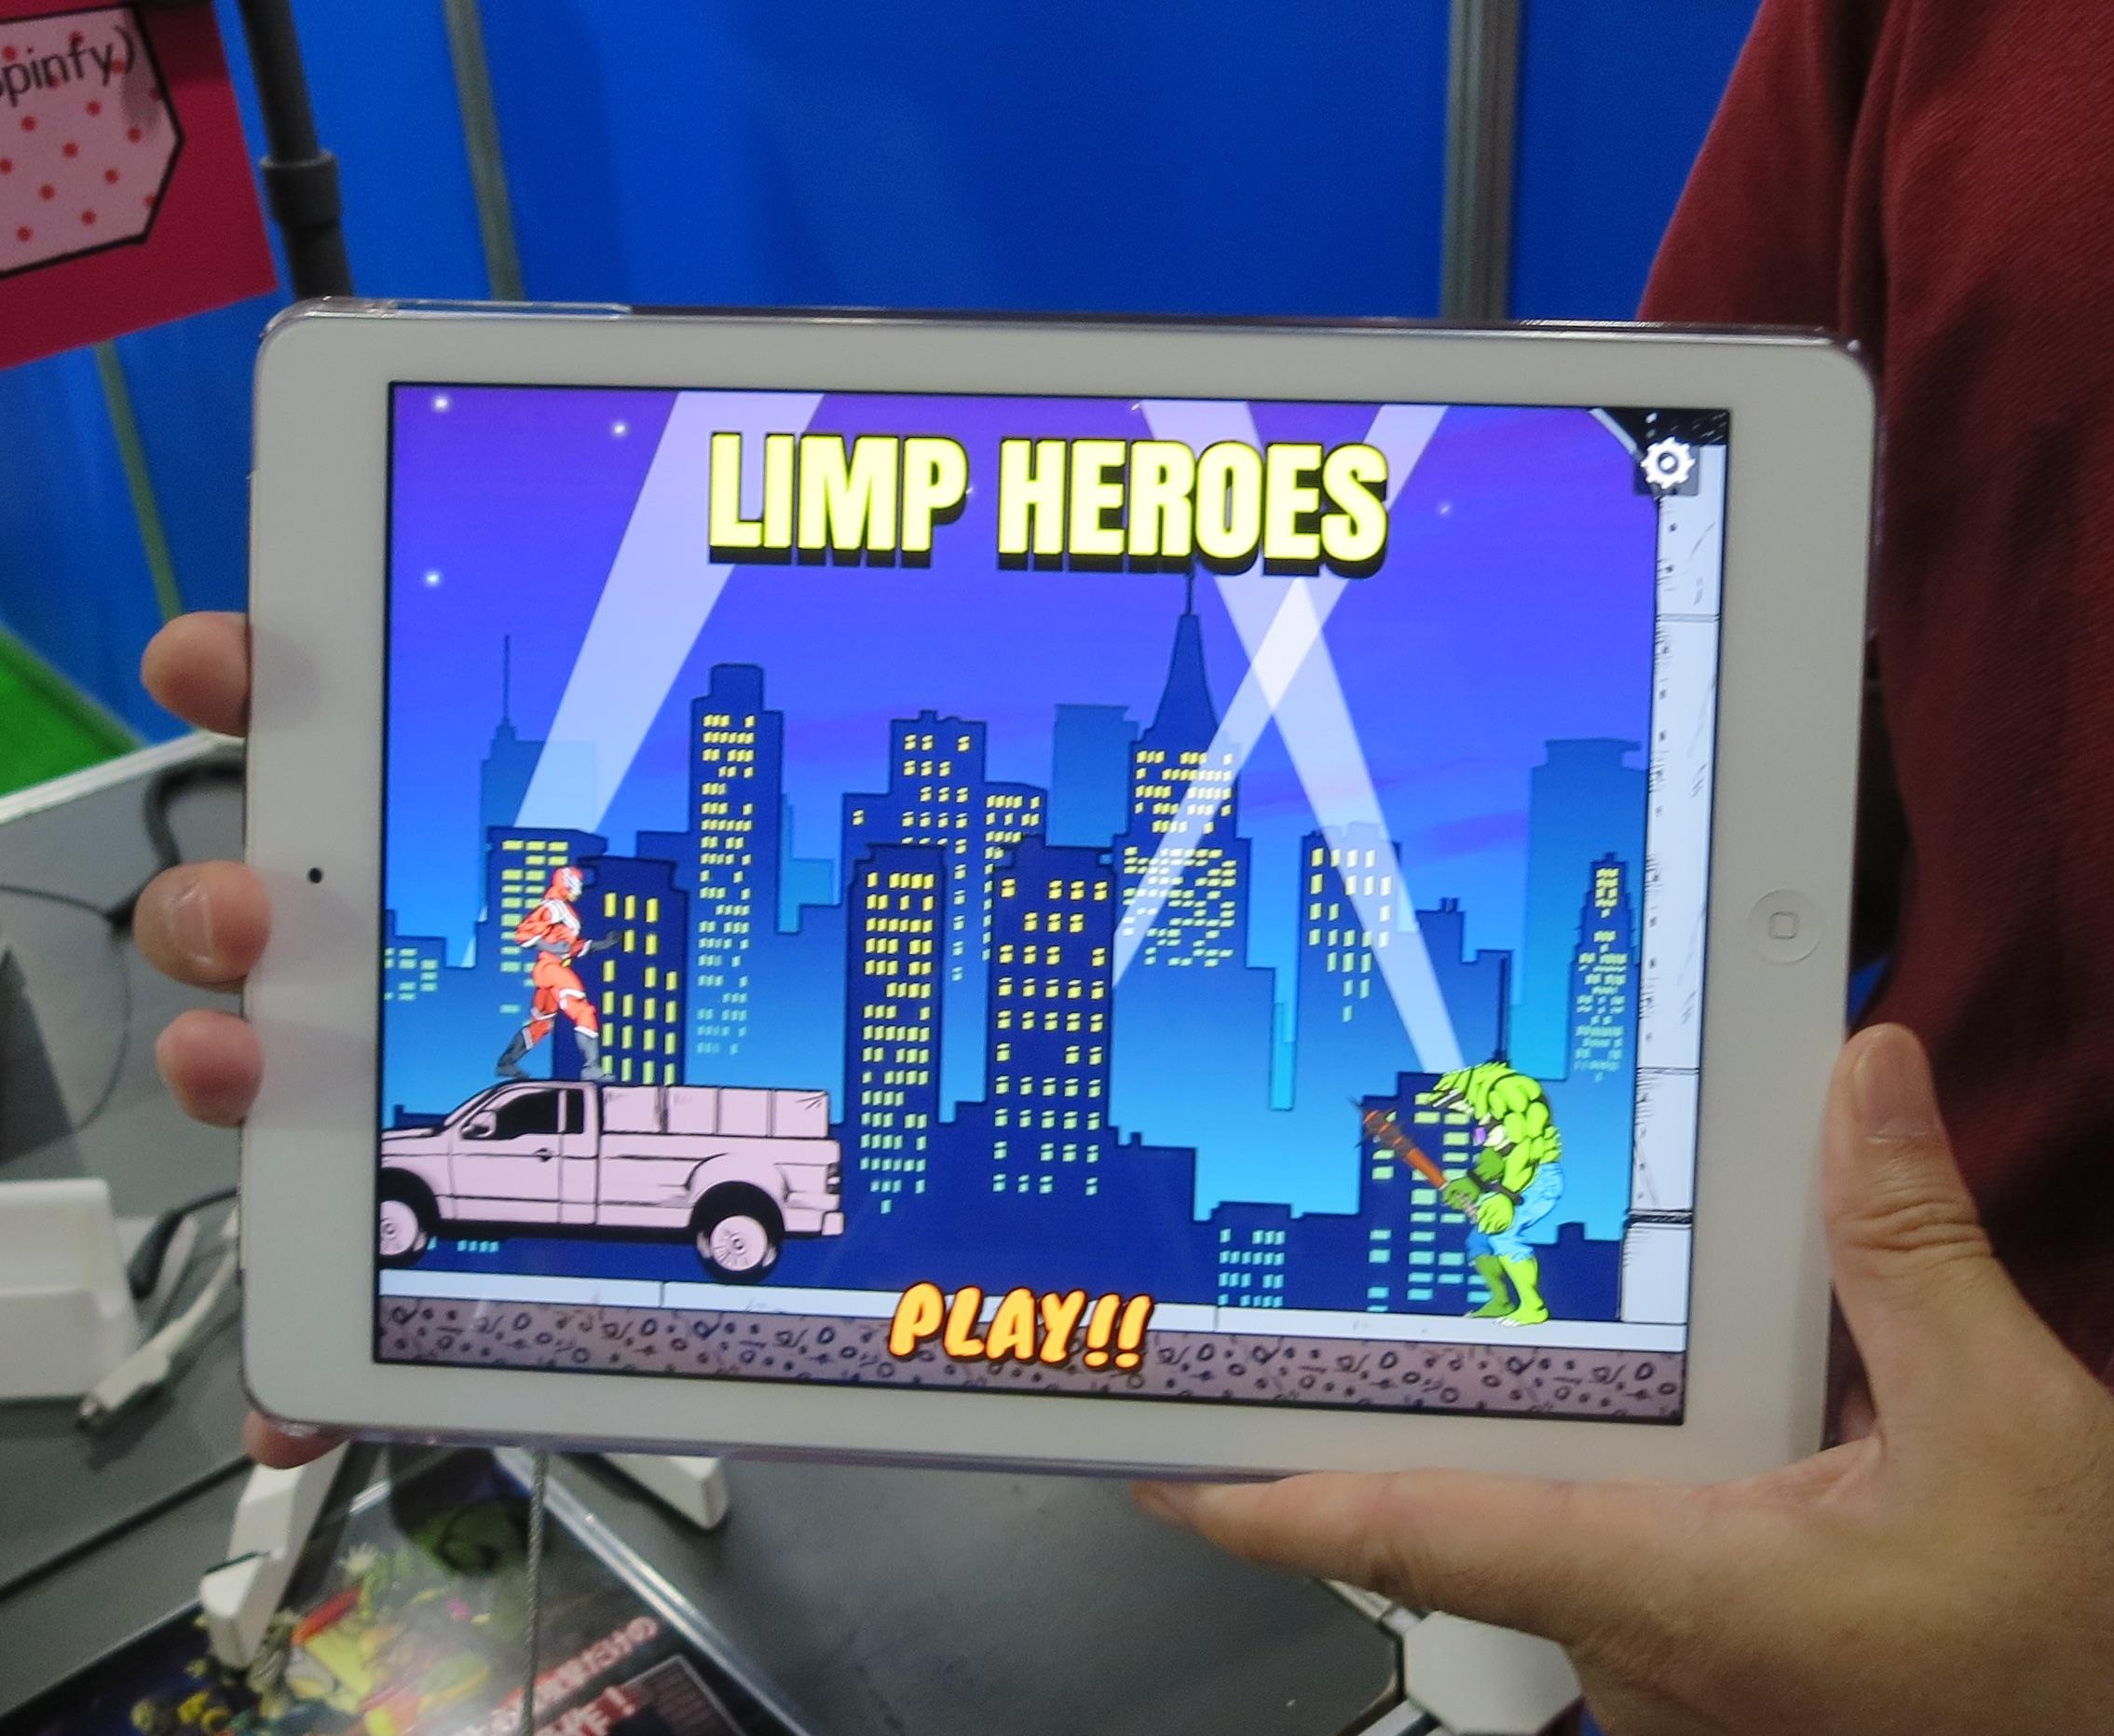 LIMP HEROESゲーム画面